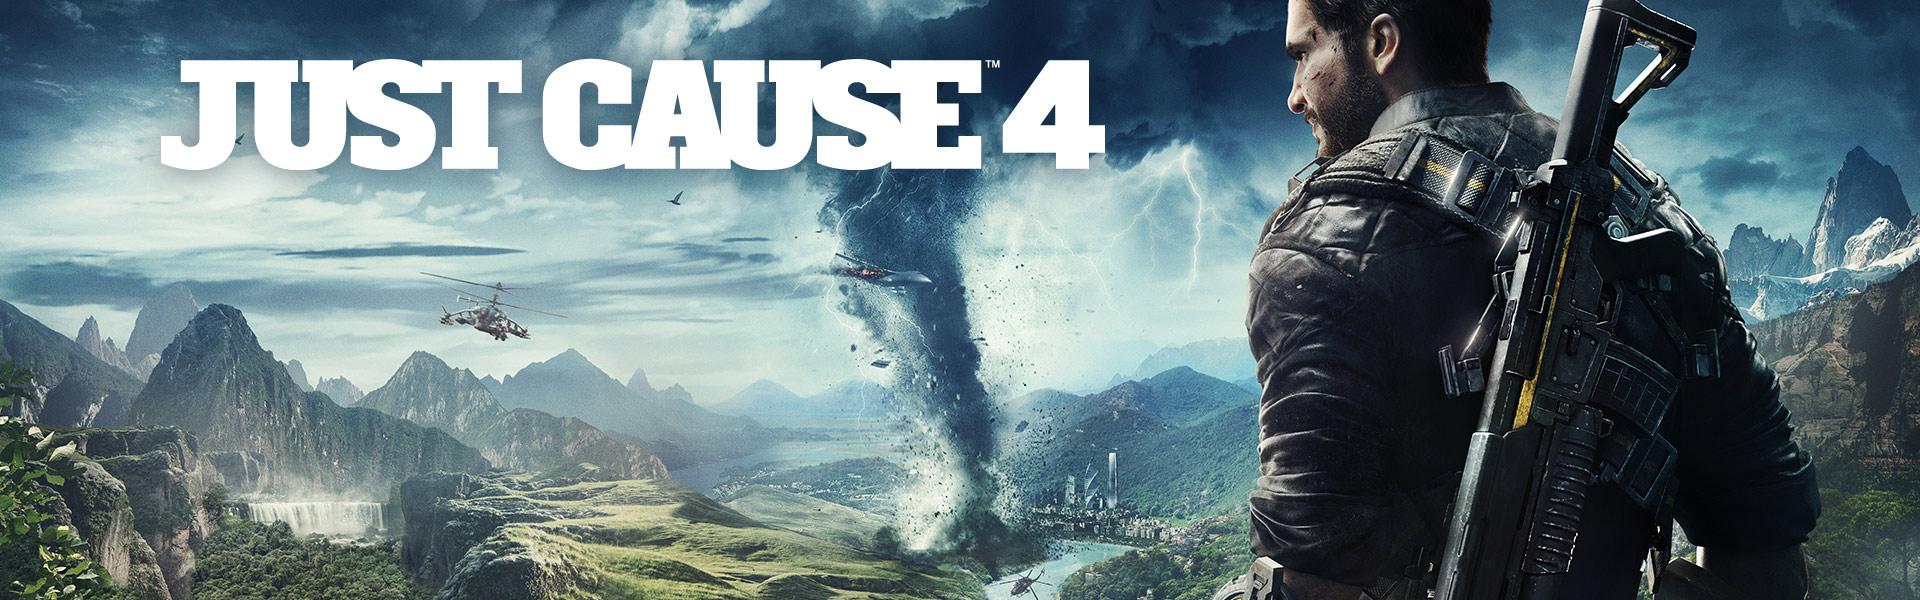 Just Cause 4 (Oyun İncelemesi) | Just Cause 4 Ara Görsel